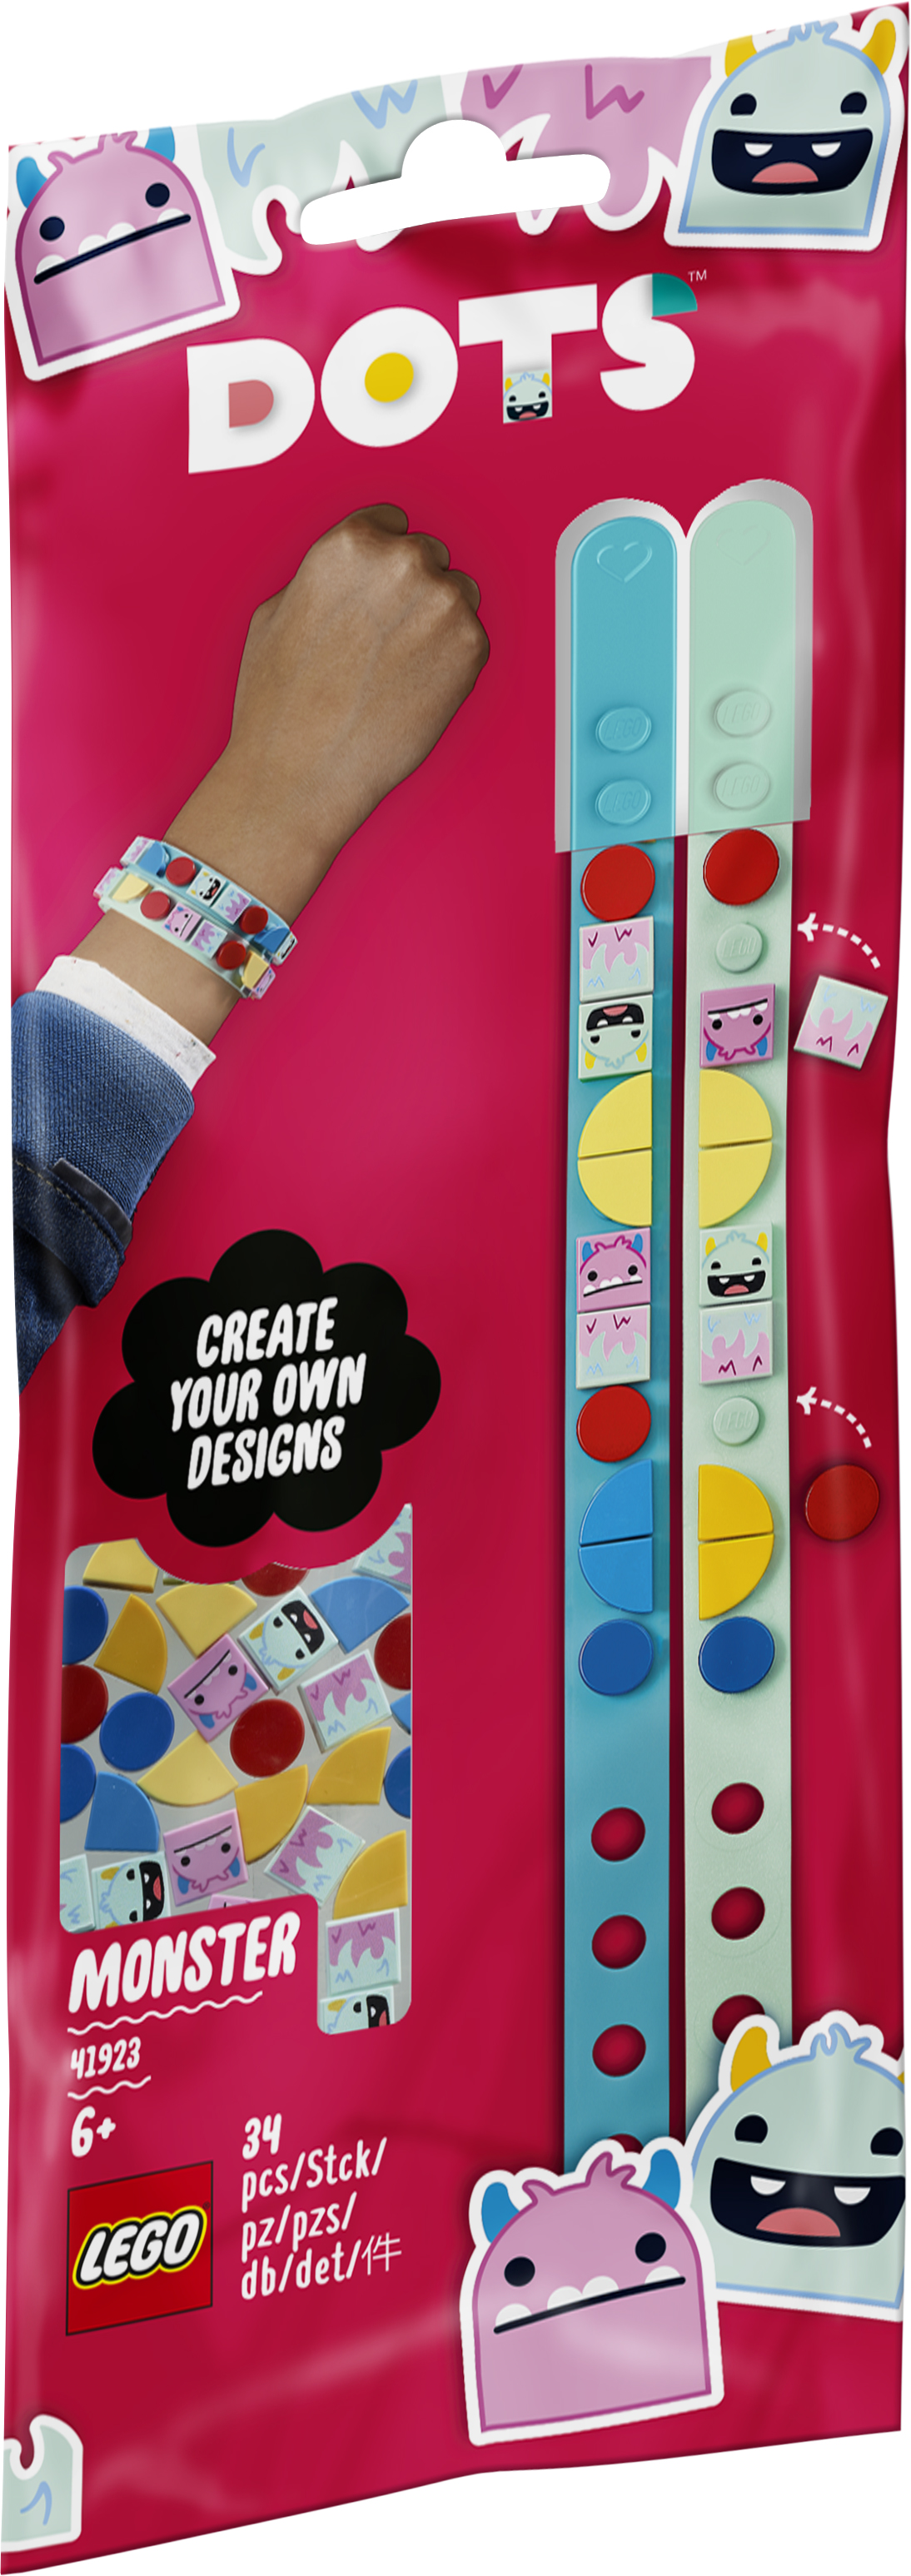 LEGO DOTS Monster-armbånd - 41923